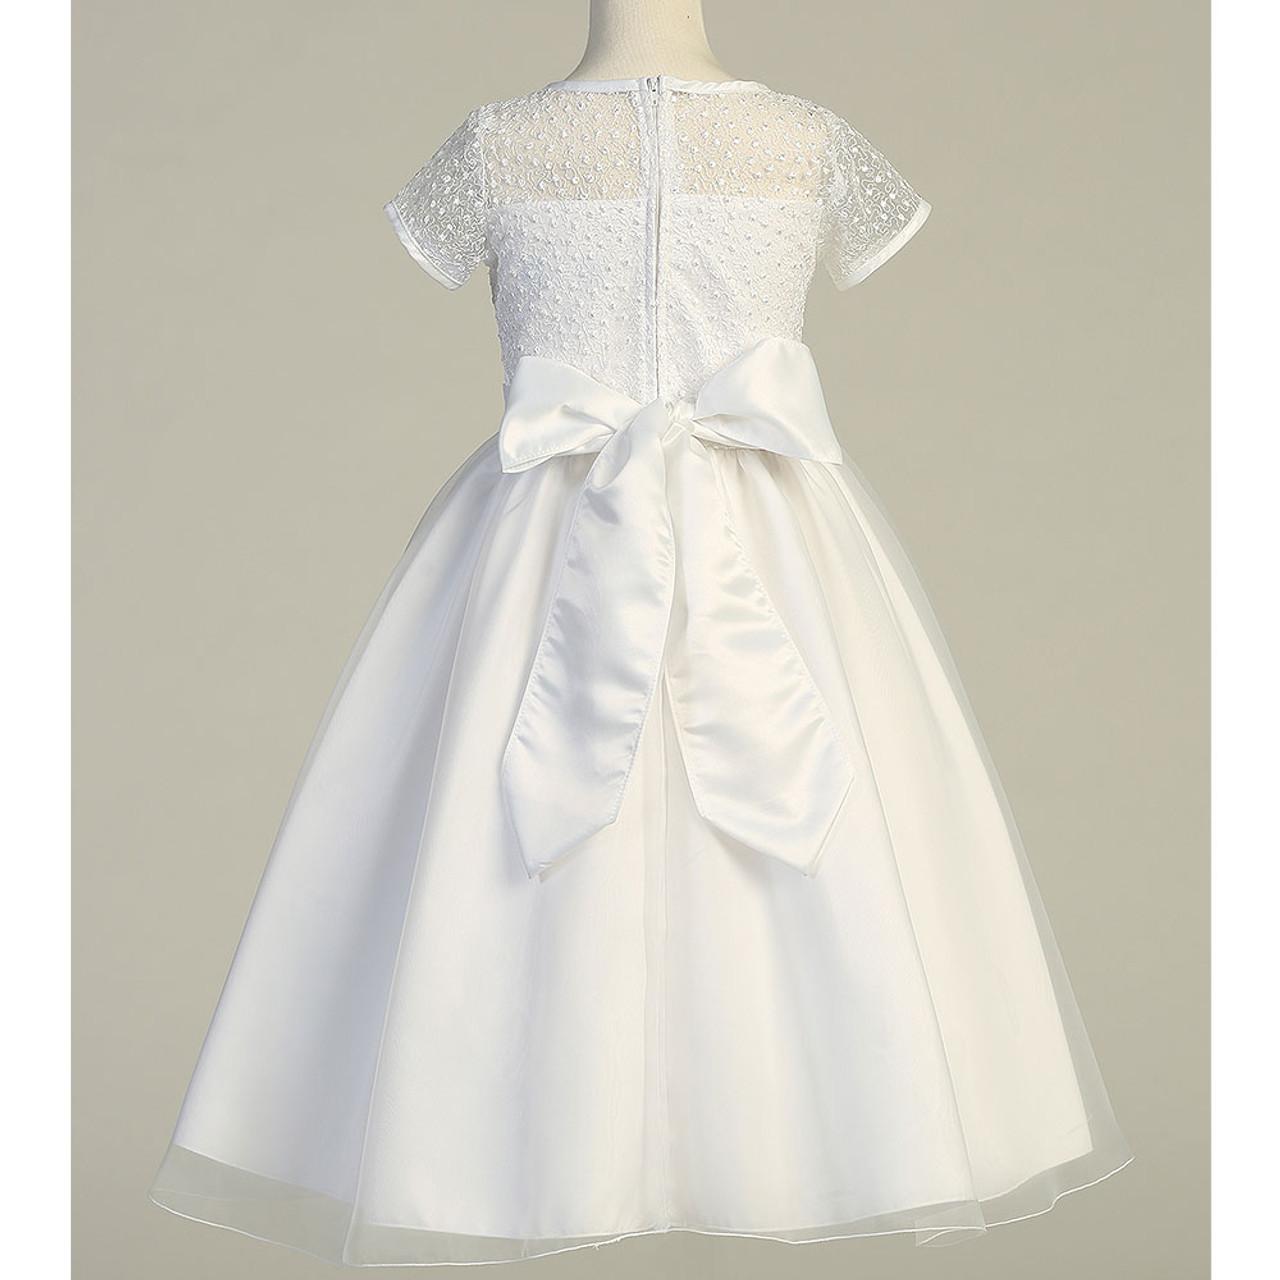 Teresa, Extended Sizes, First Communion Dress